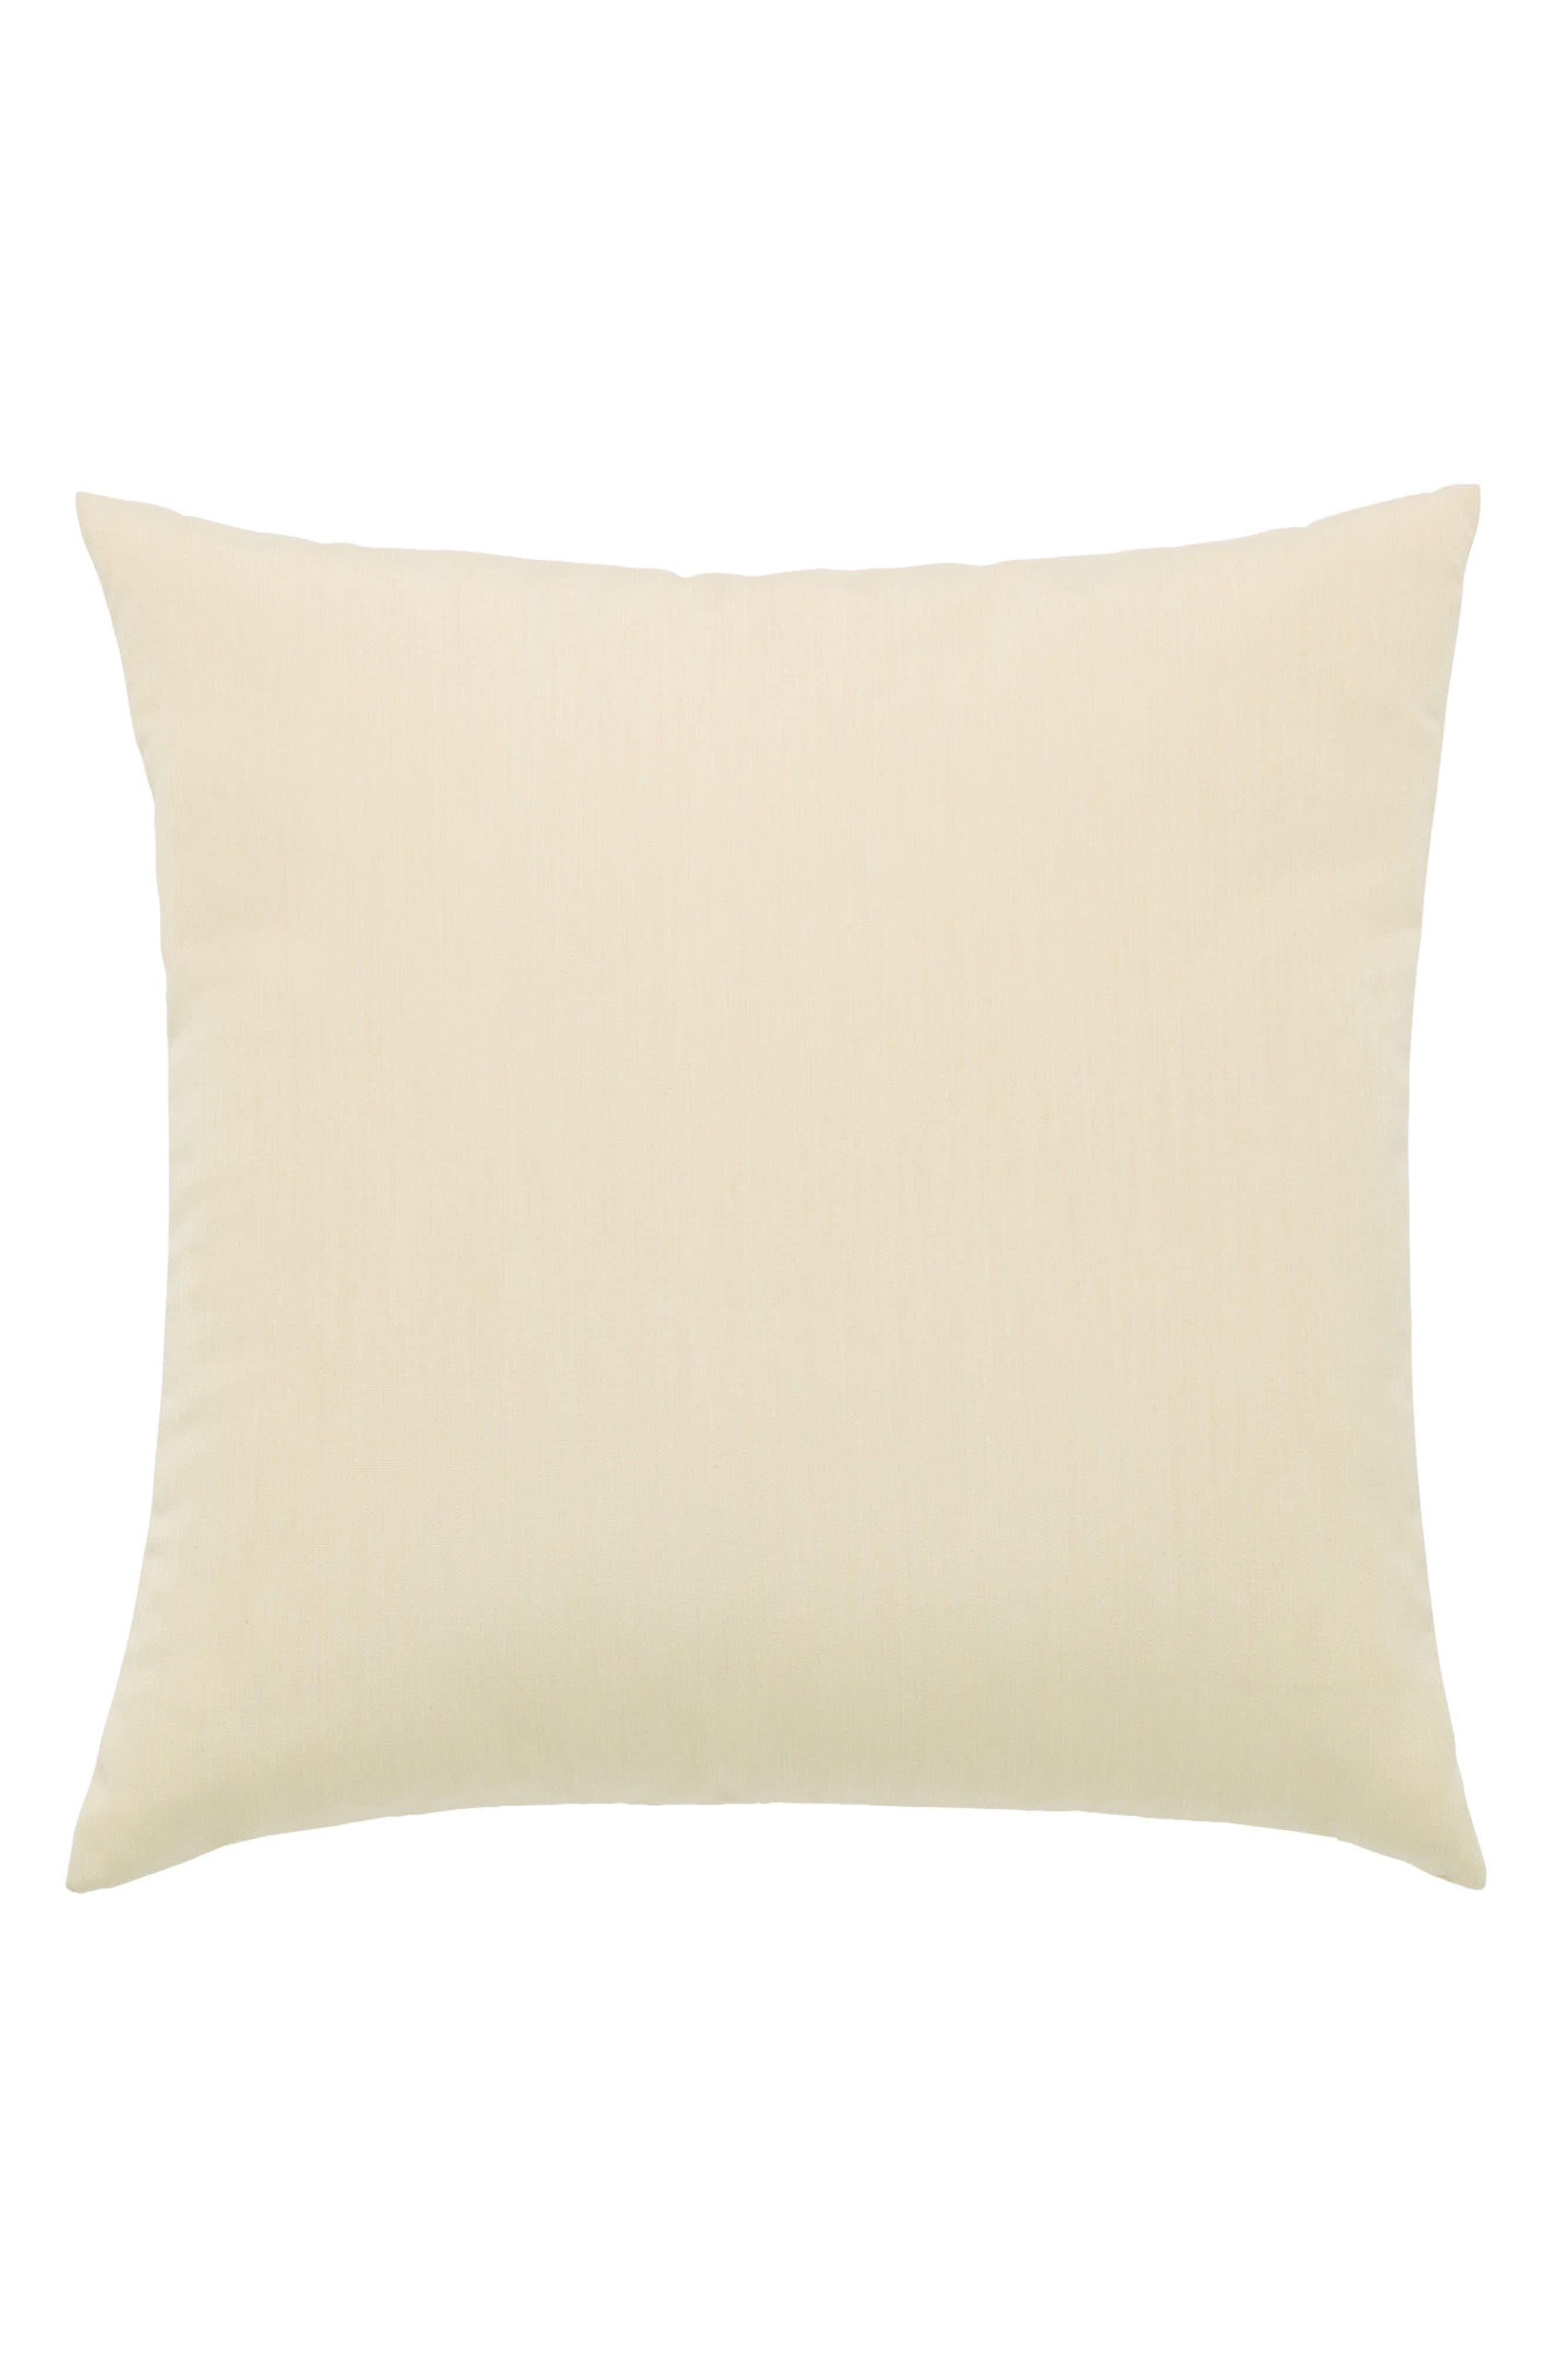 Noir Block Indoor/Outdoor Accent Pillow,                             Alternate thumbnail 2, color,                             Blue/ Black